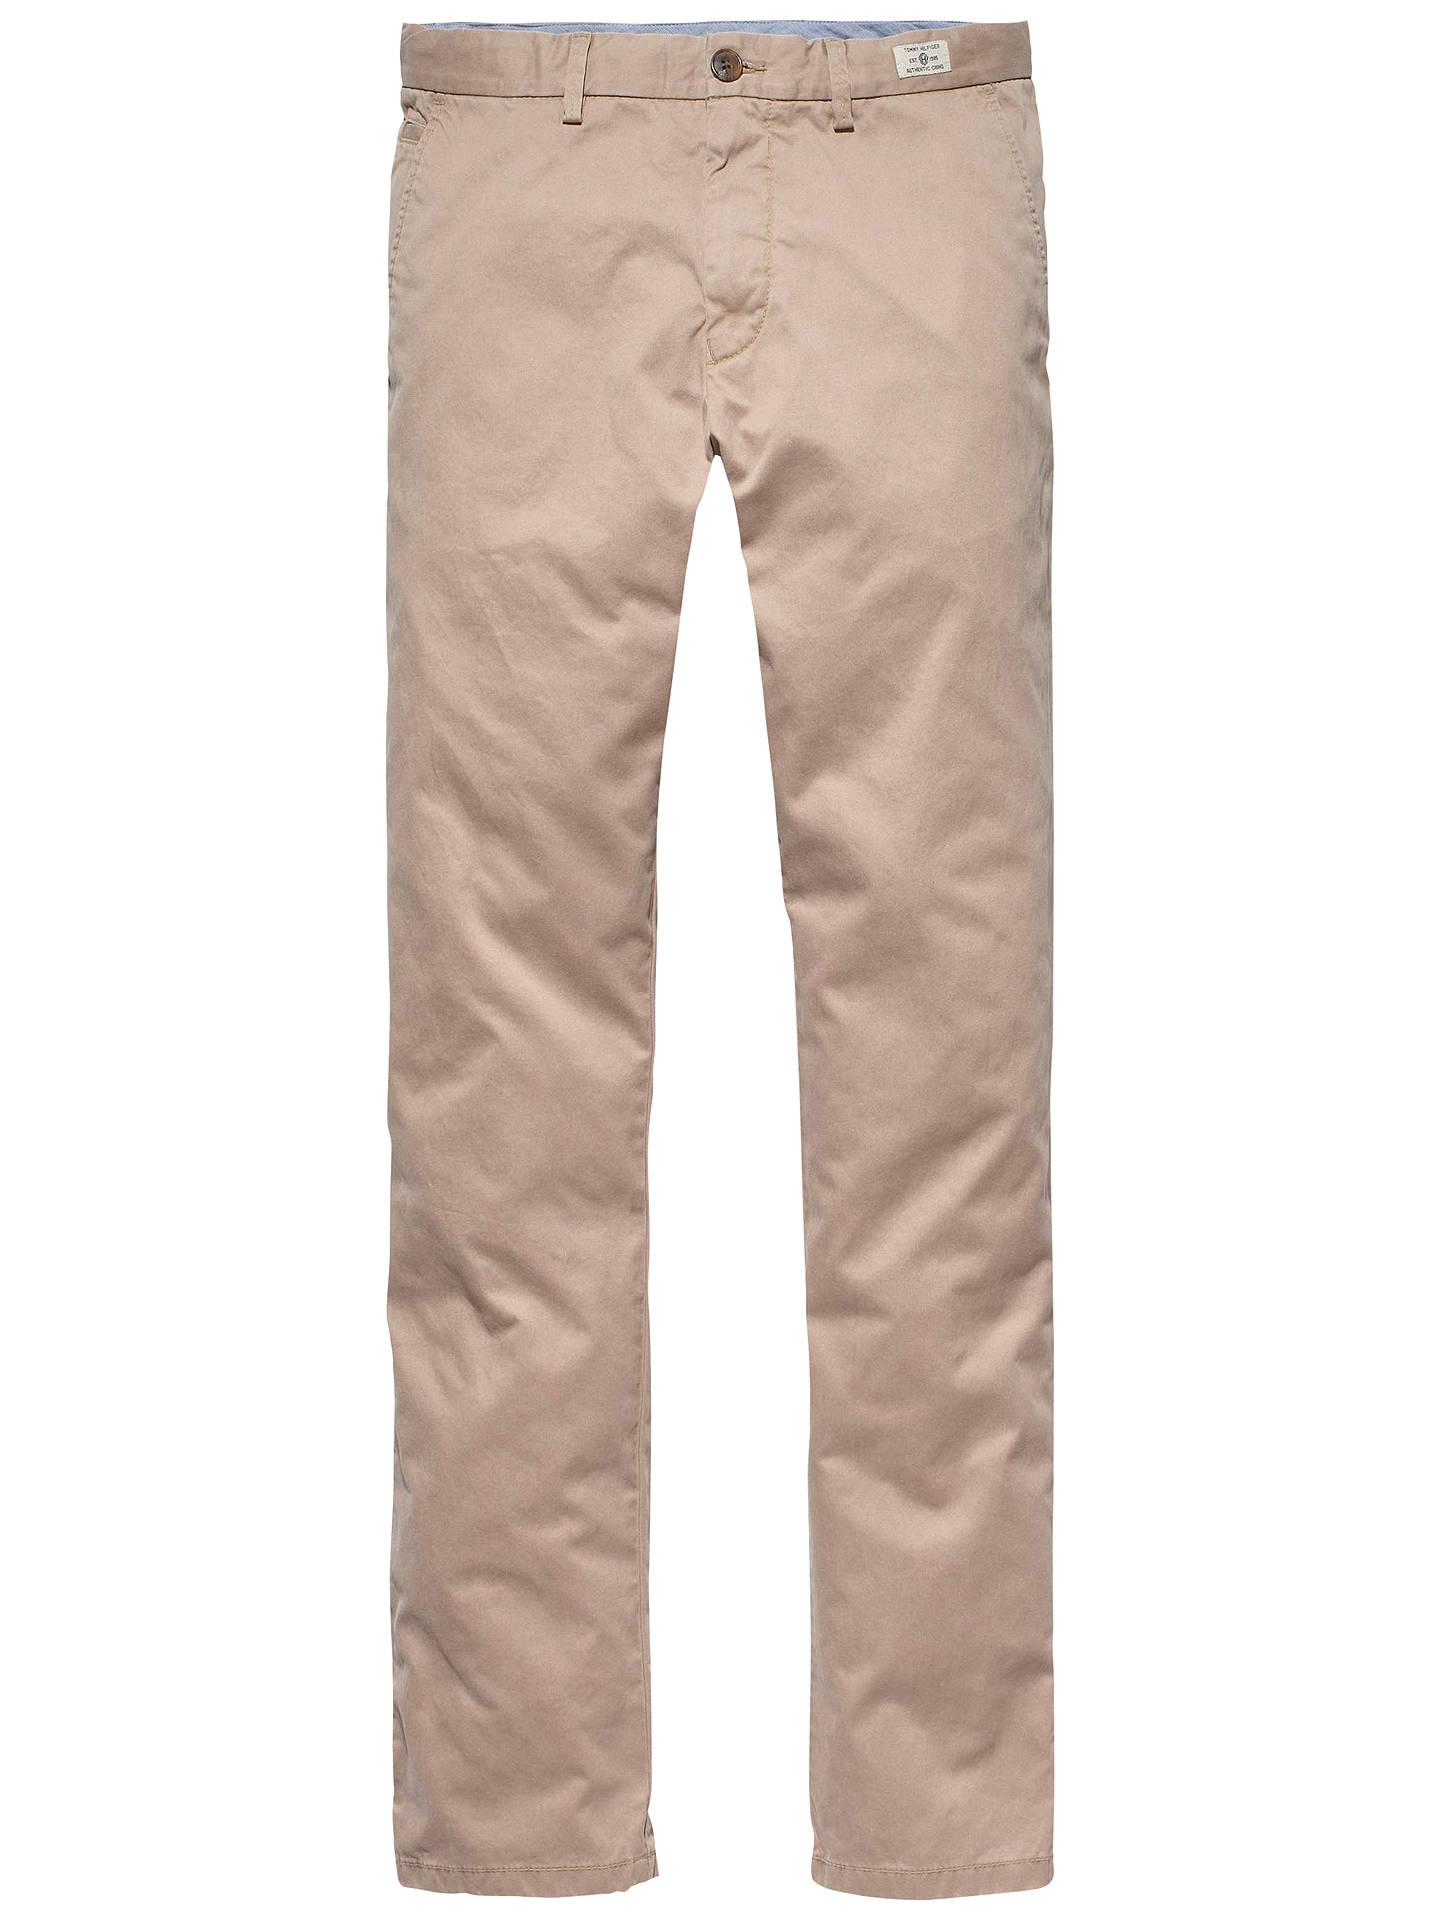 TOMMY HILFIGER Mercer Chino Org Str Twl Pantalones para Hombre